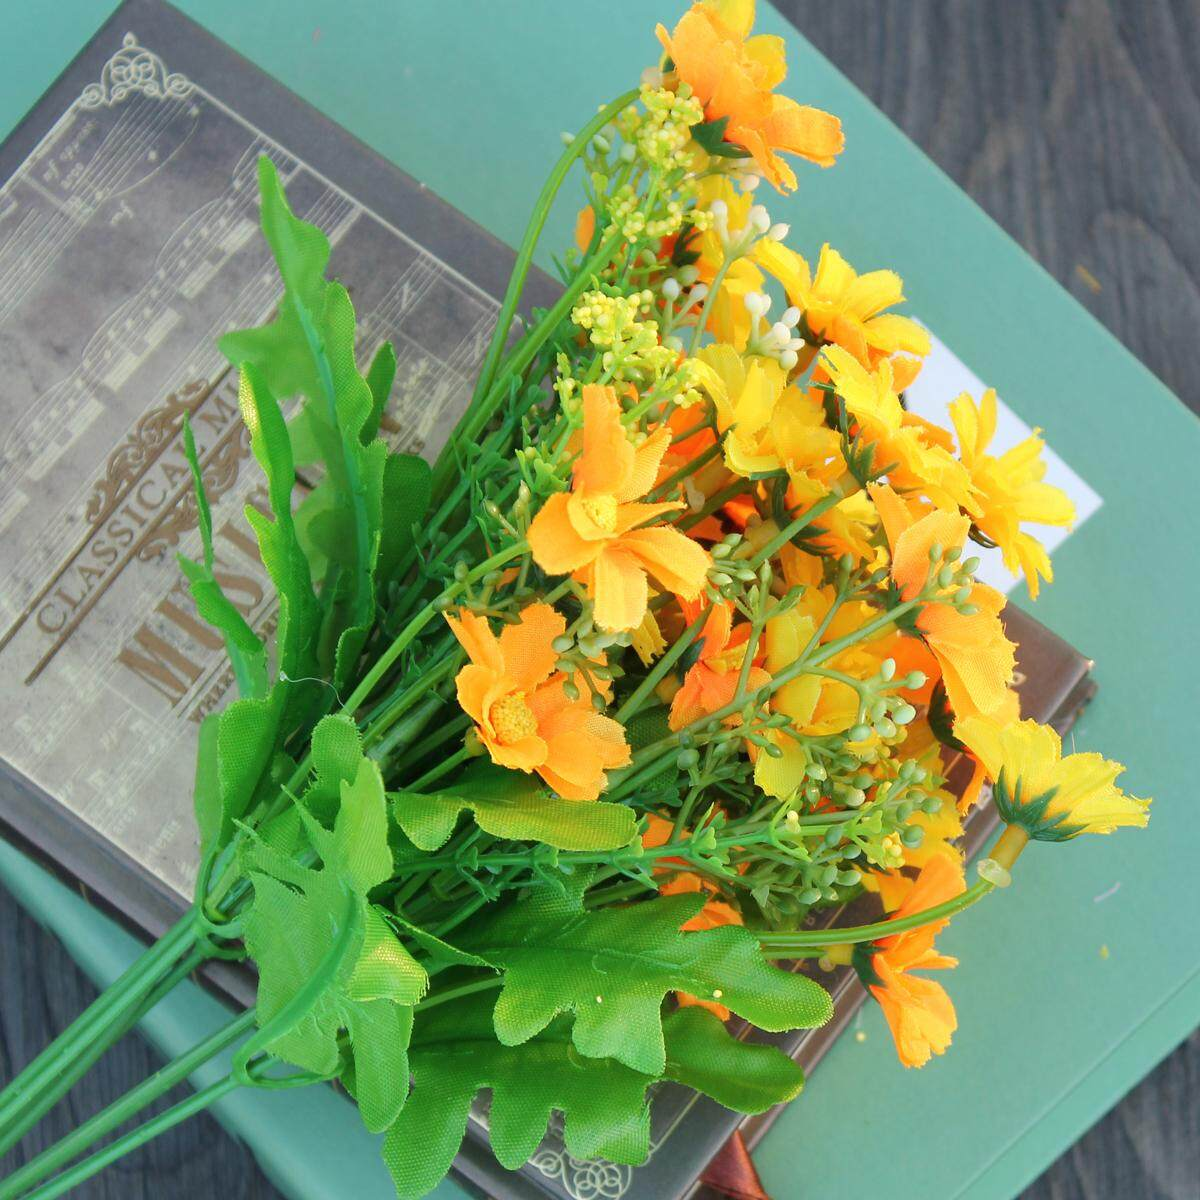 5 Buket Buatan Cineraria Sutra Bunga Daun Rumah Pesta Pernikahan  Dekorasi-Internasional 62a9a67784